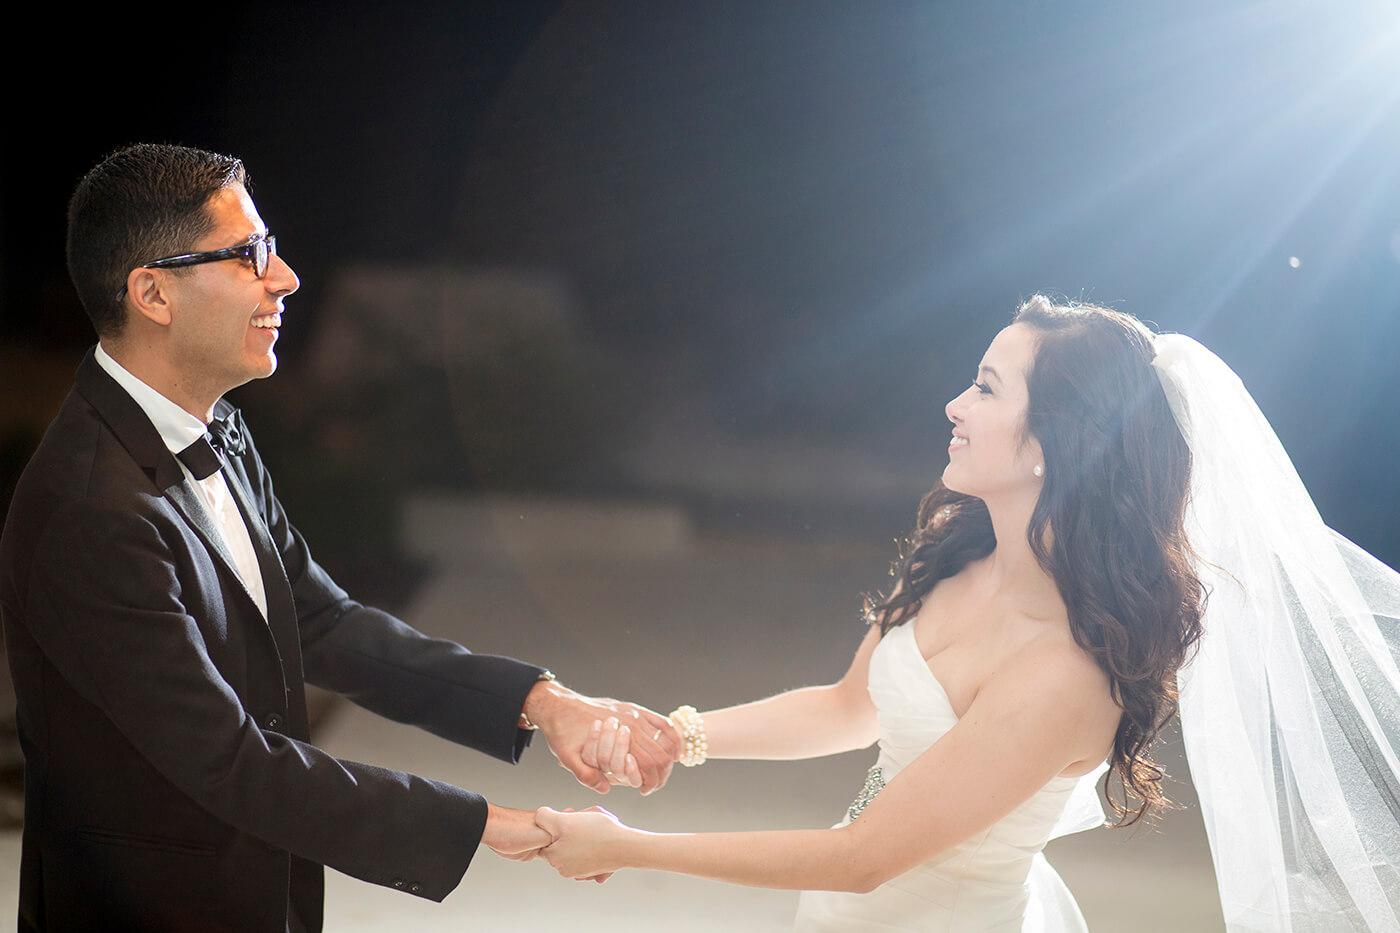 Wedding_Couples_Photographer_Austin_Texas_Dennis_Burnett_02